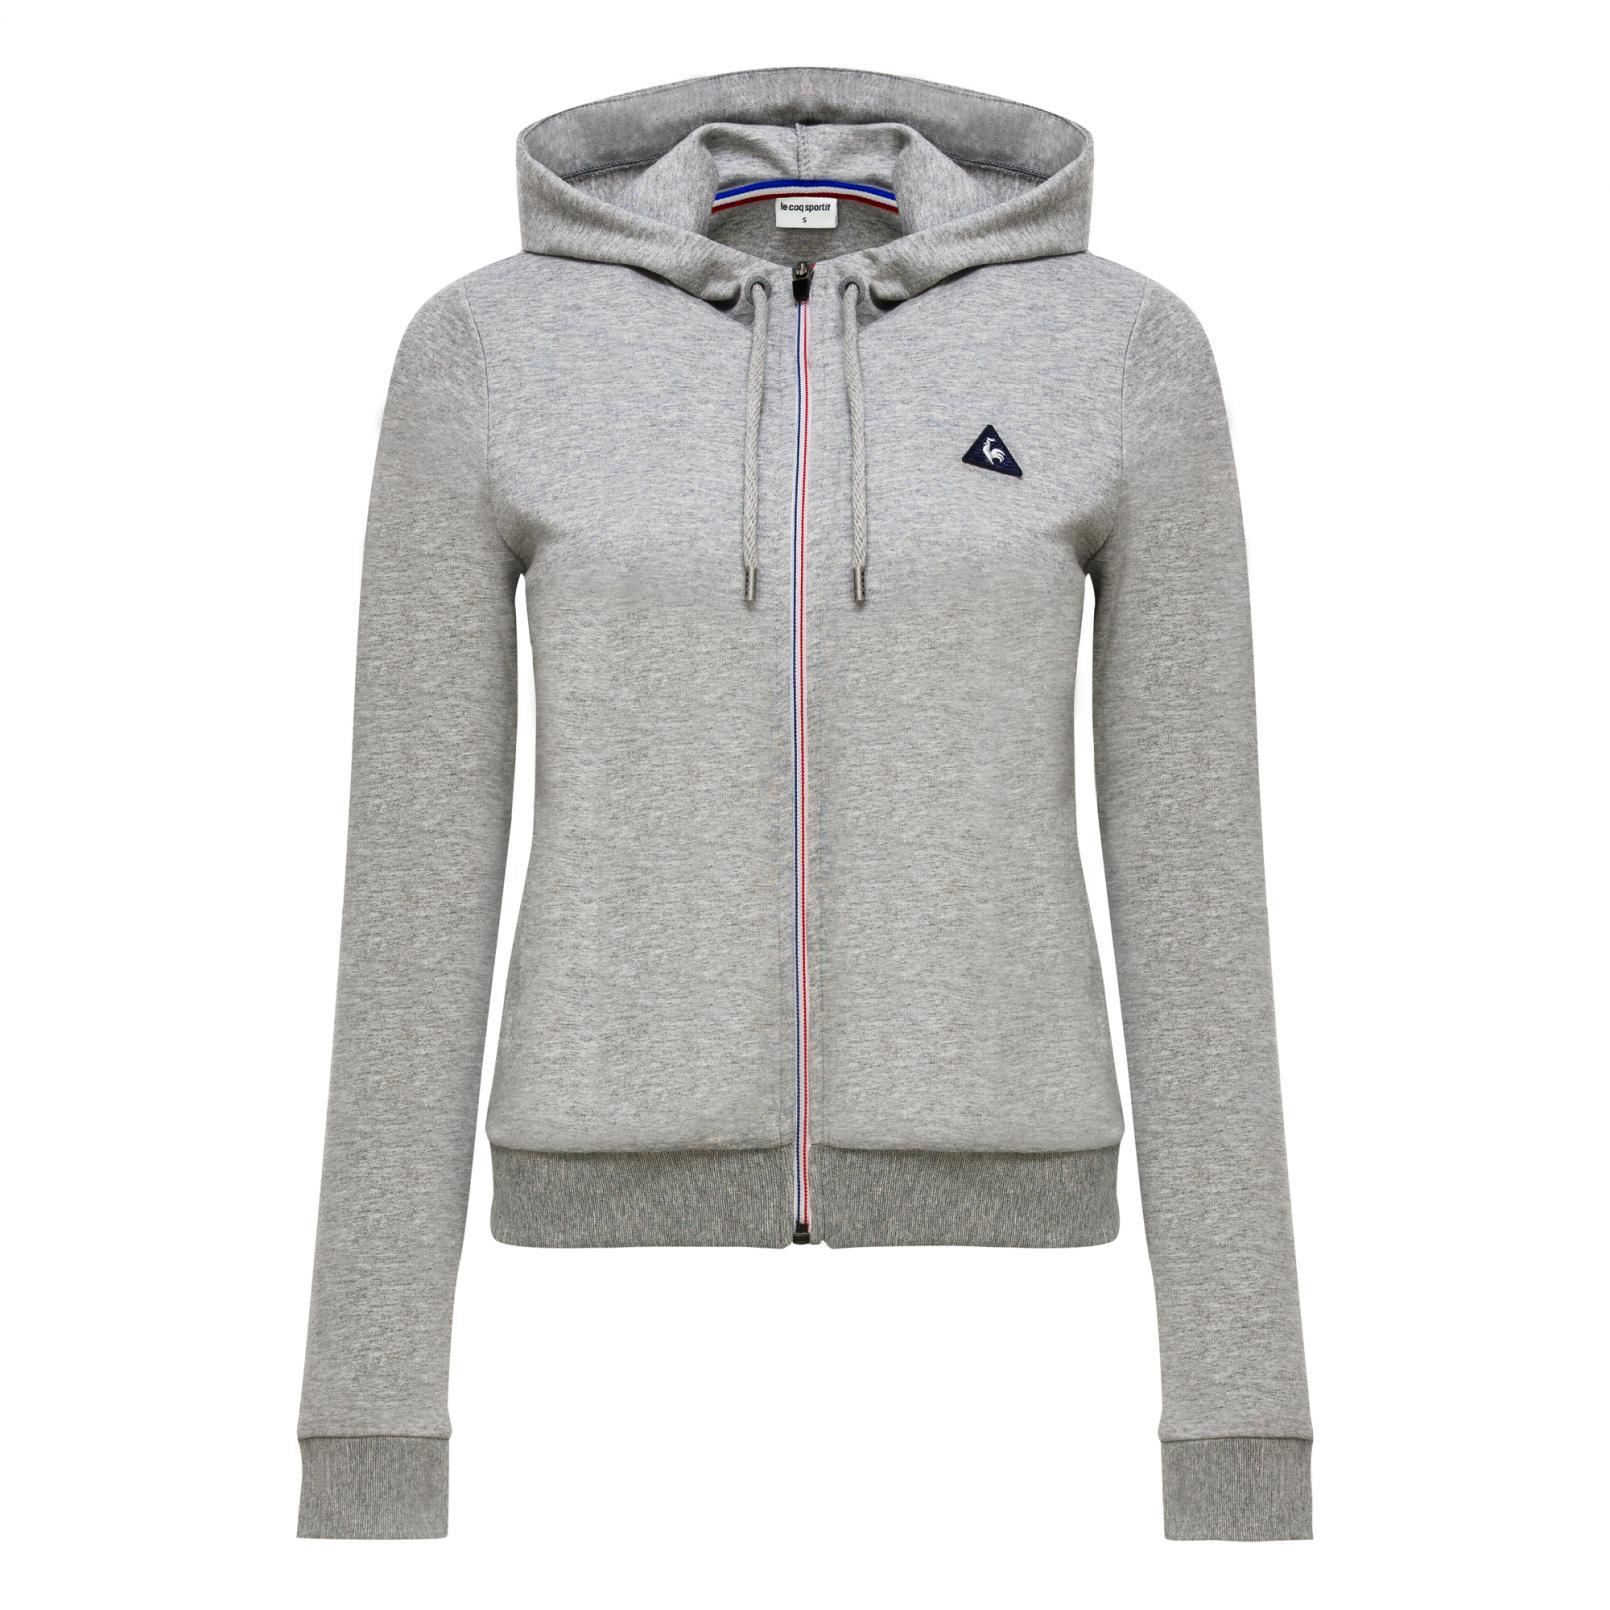 Sweatshirts & Hoodies – Le Coq Sportif Essentiels Pull-over hood Grey